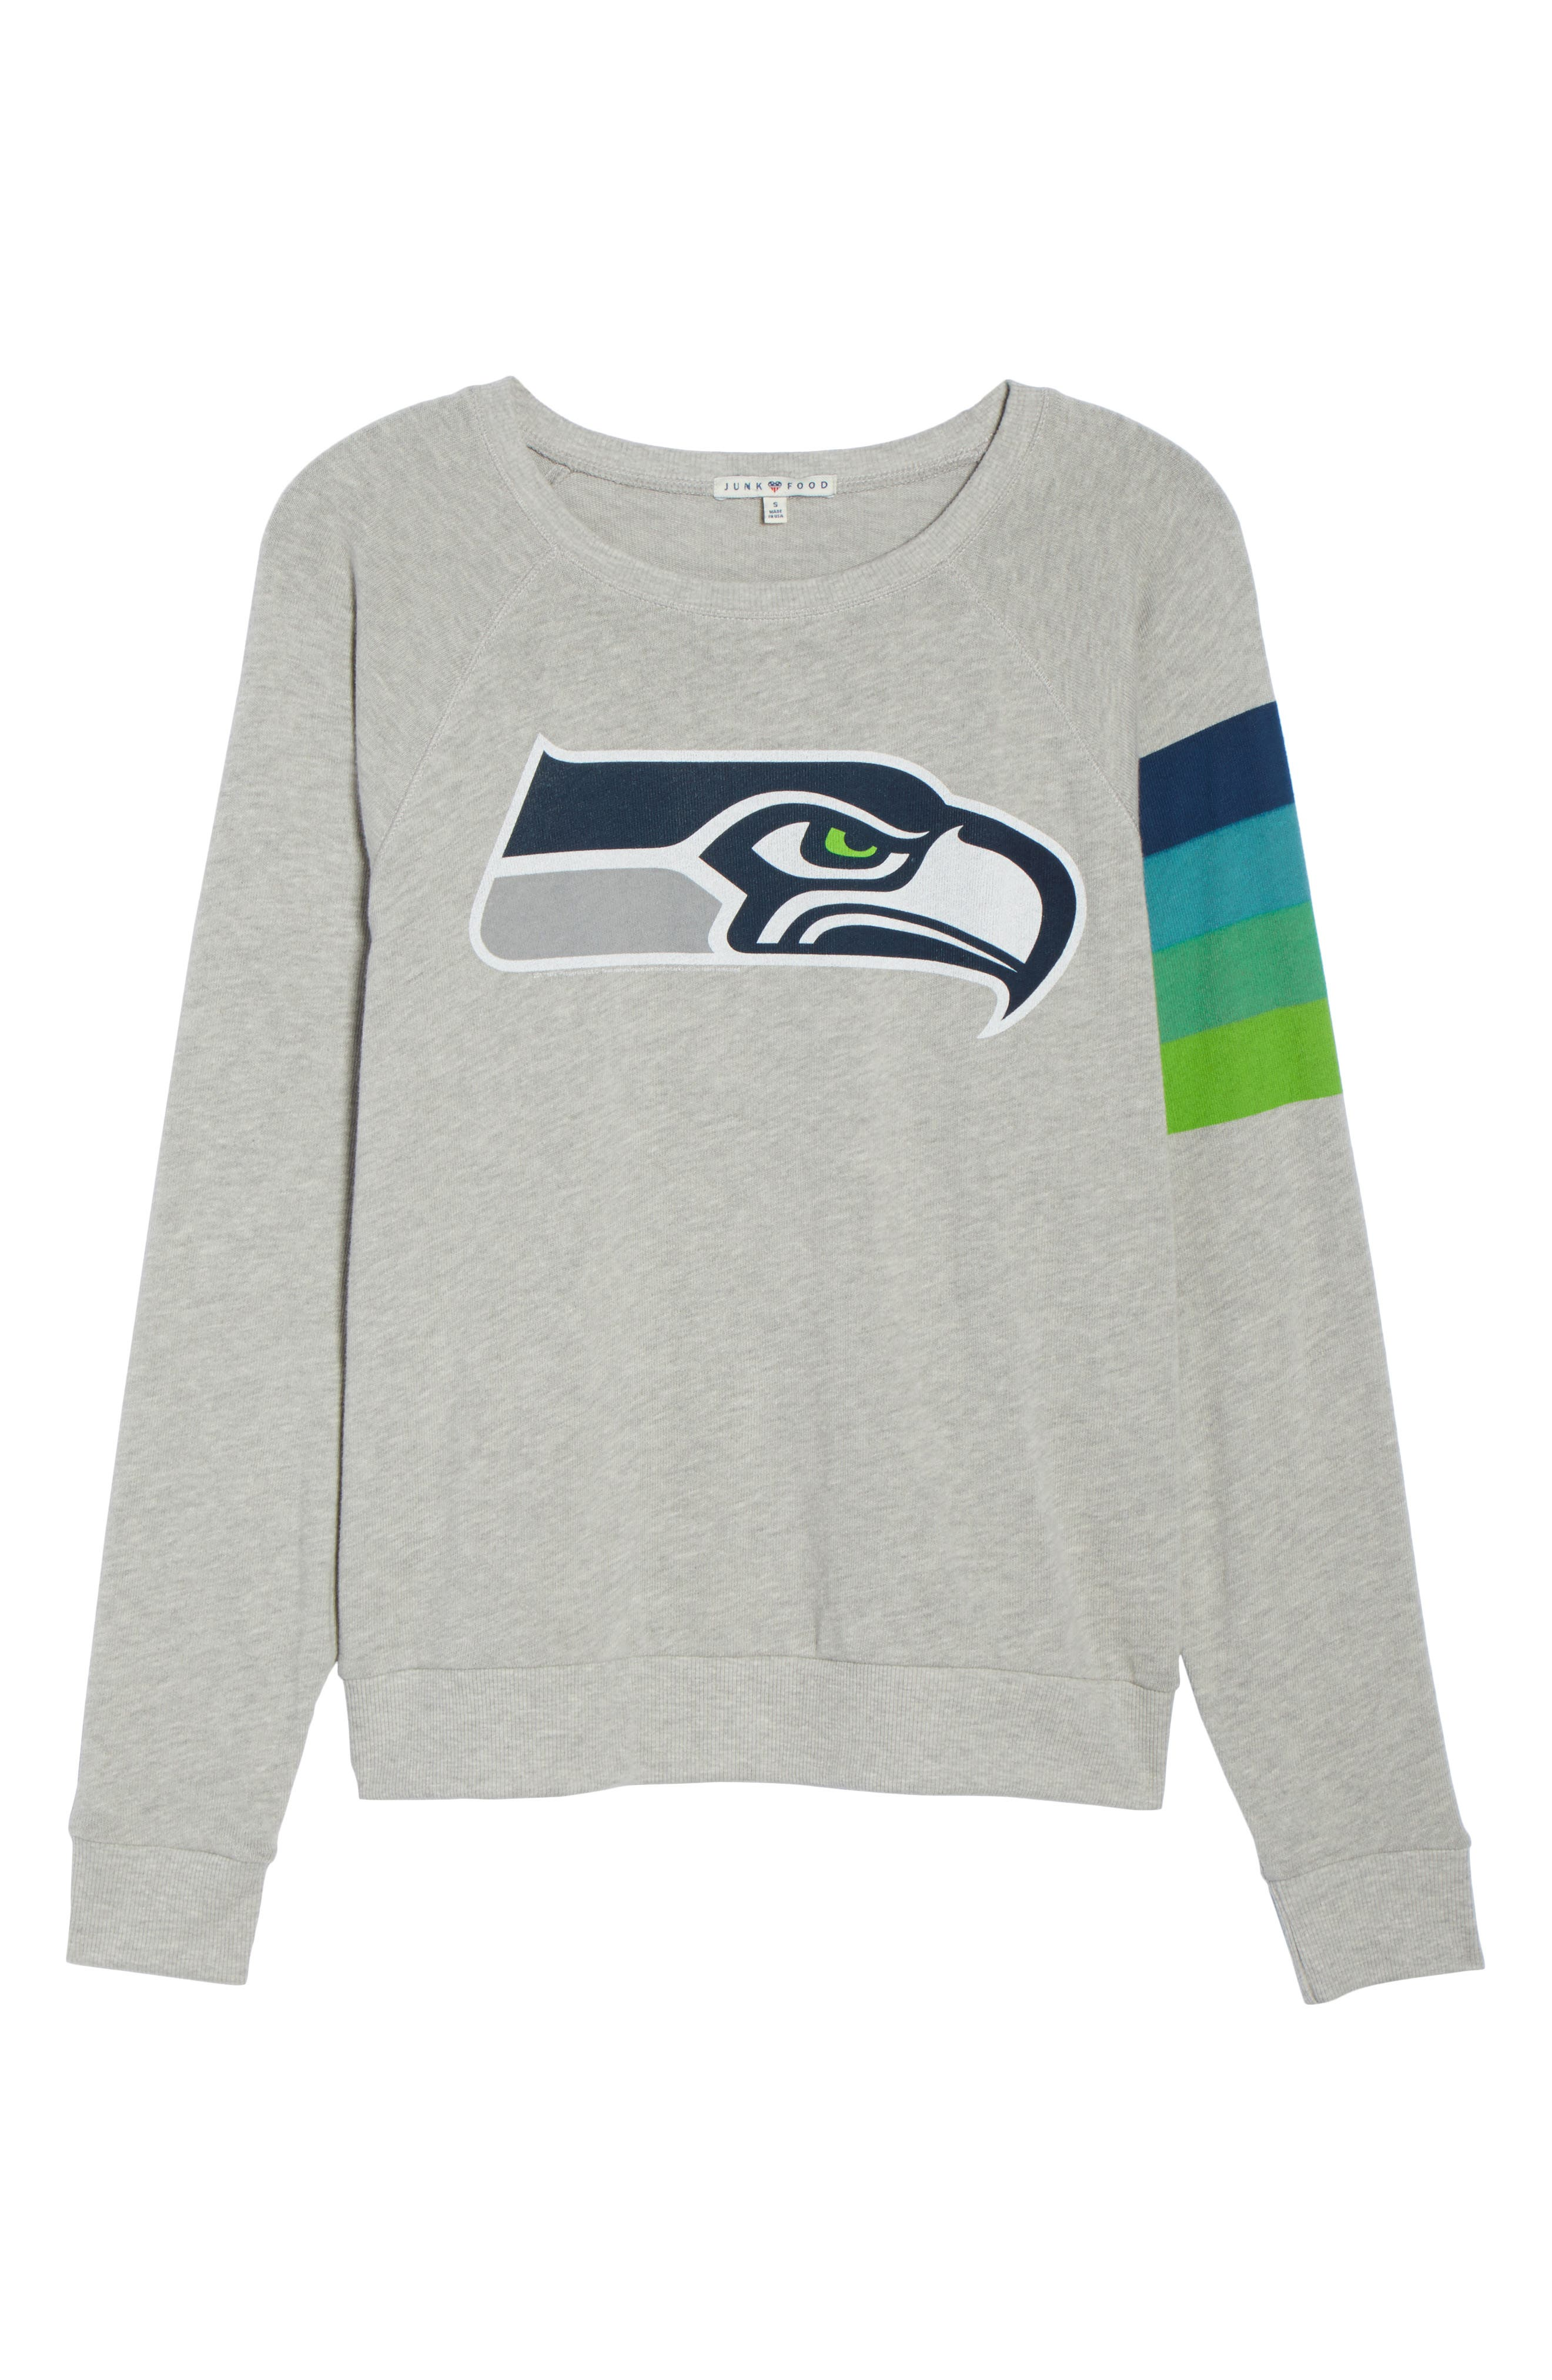 NFL Seattle Seahawks Hacci Sweatshirt,                             Alternate thumbnail 7, color,                             Dove Heather Grey